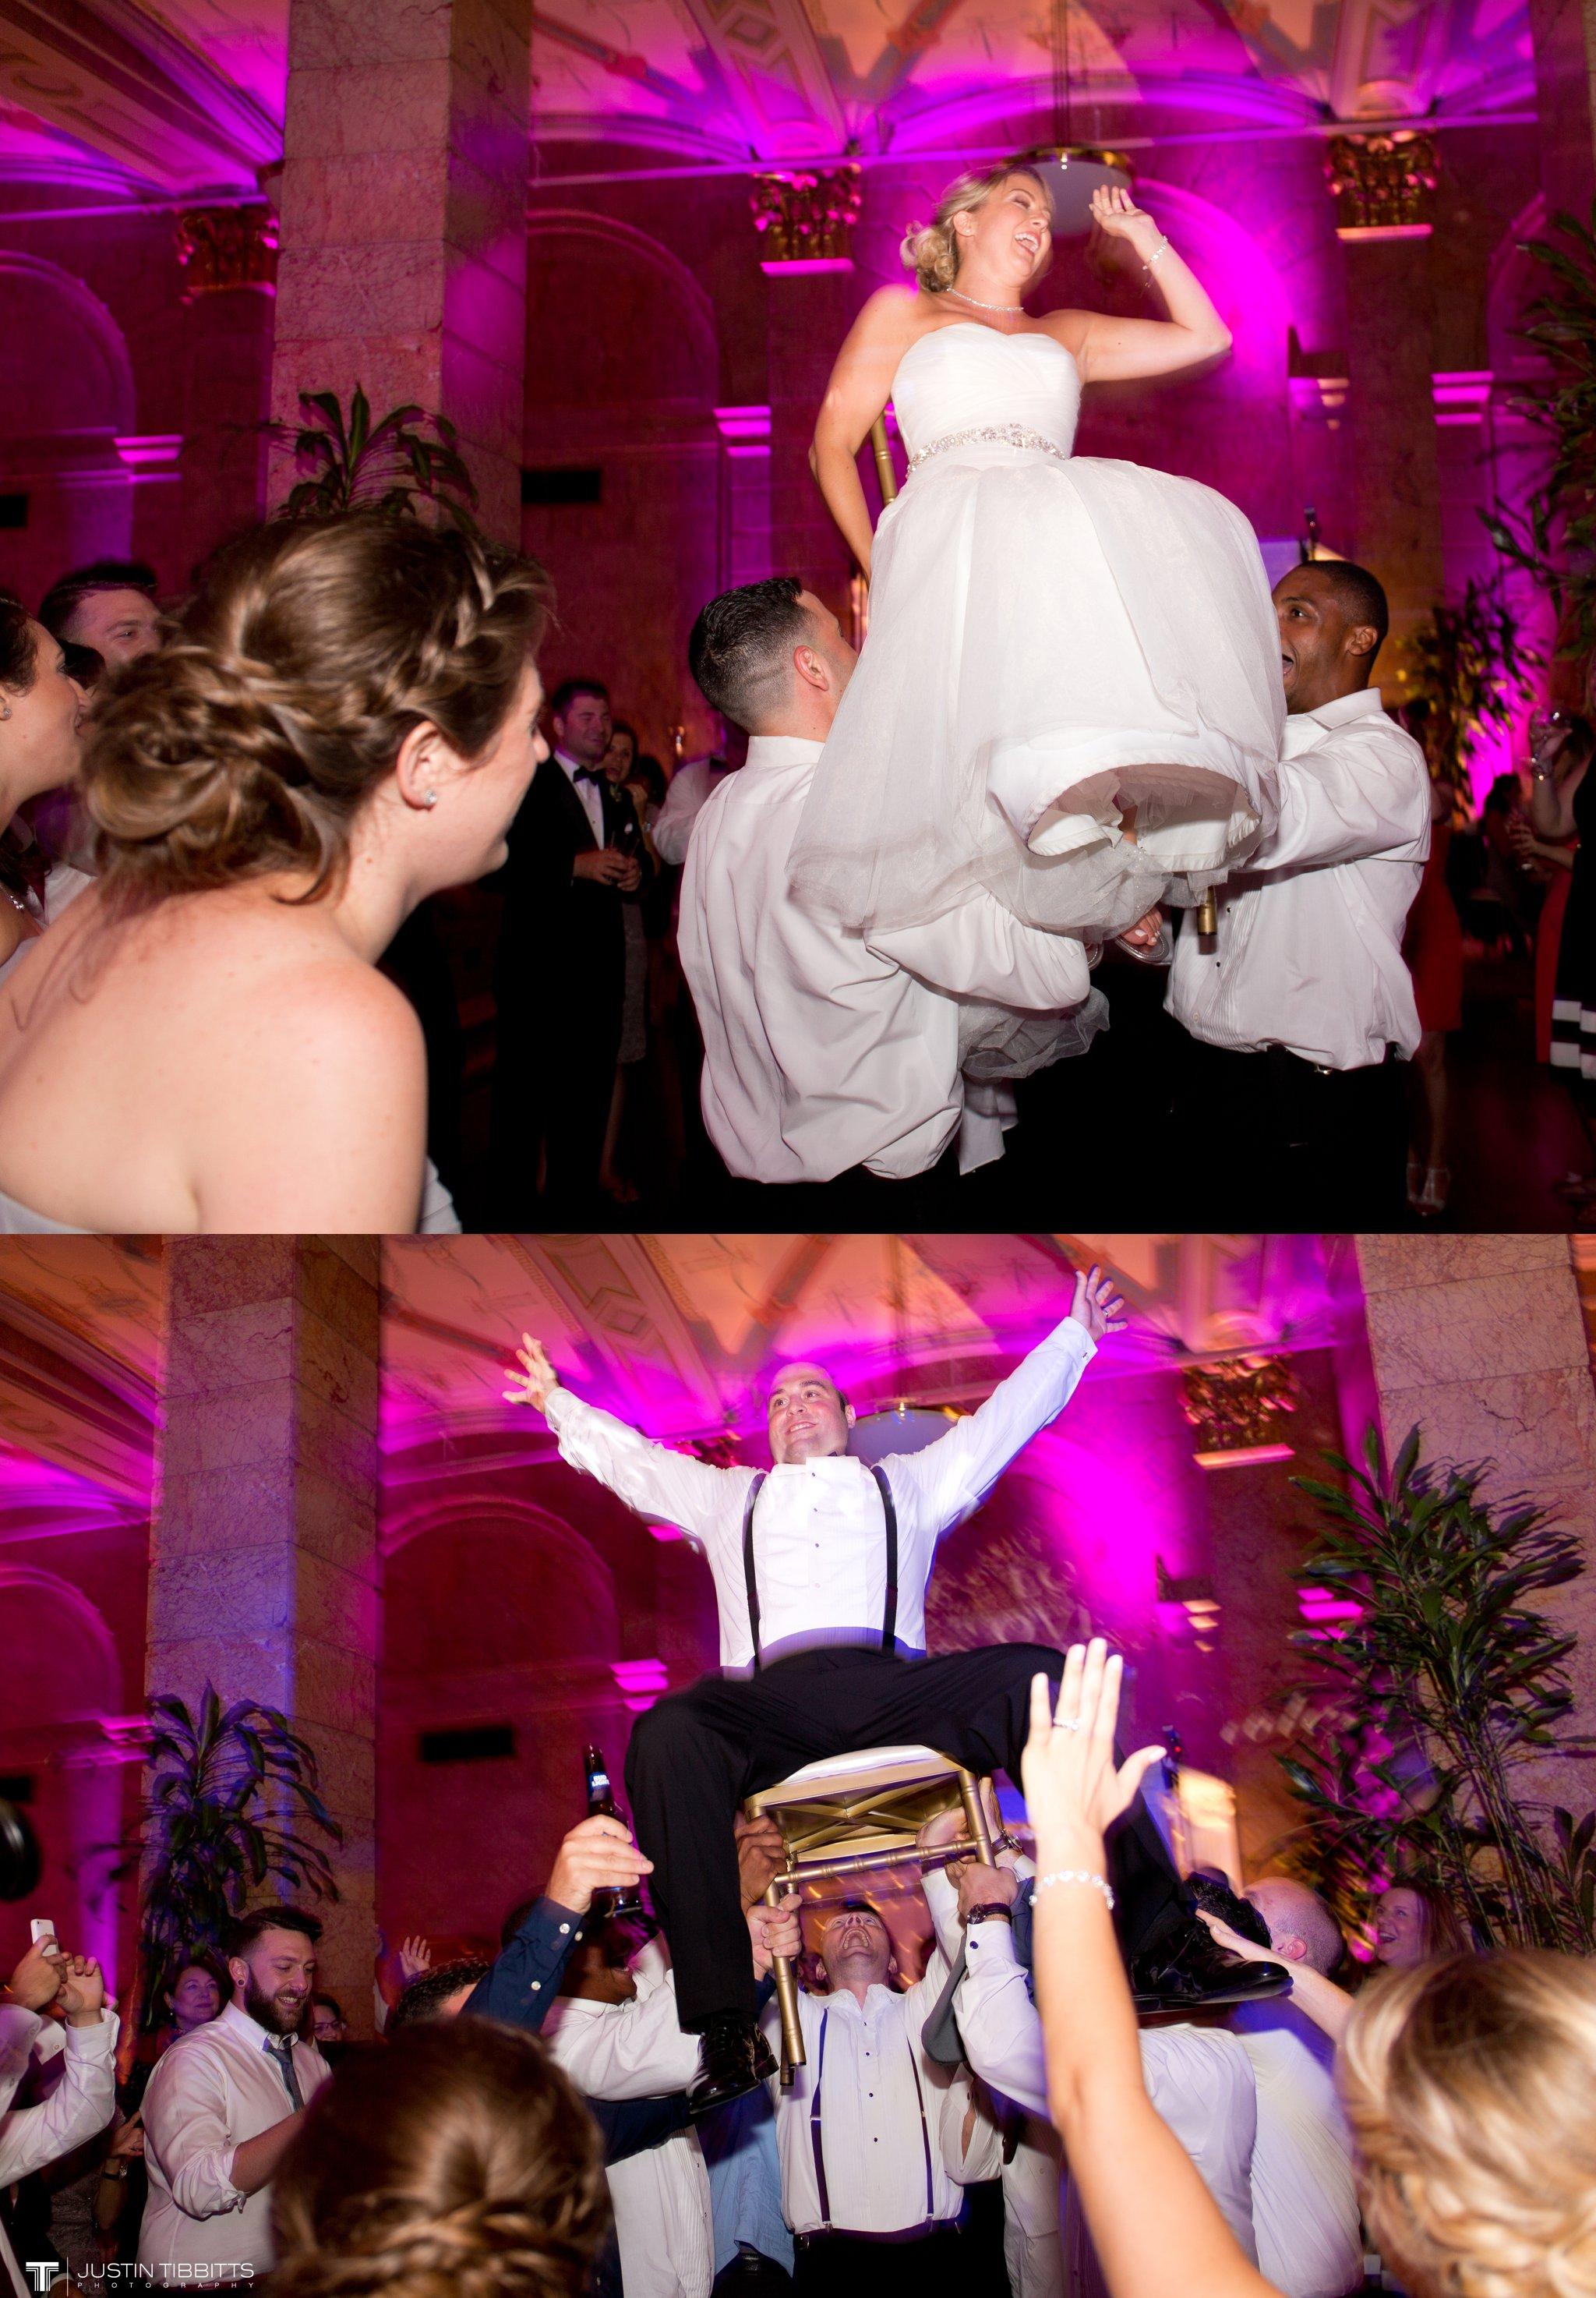 state-room-wedding-photos-with-amanda-and-nick_0186